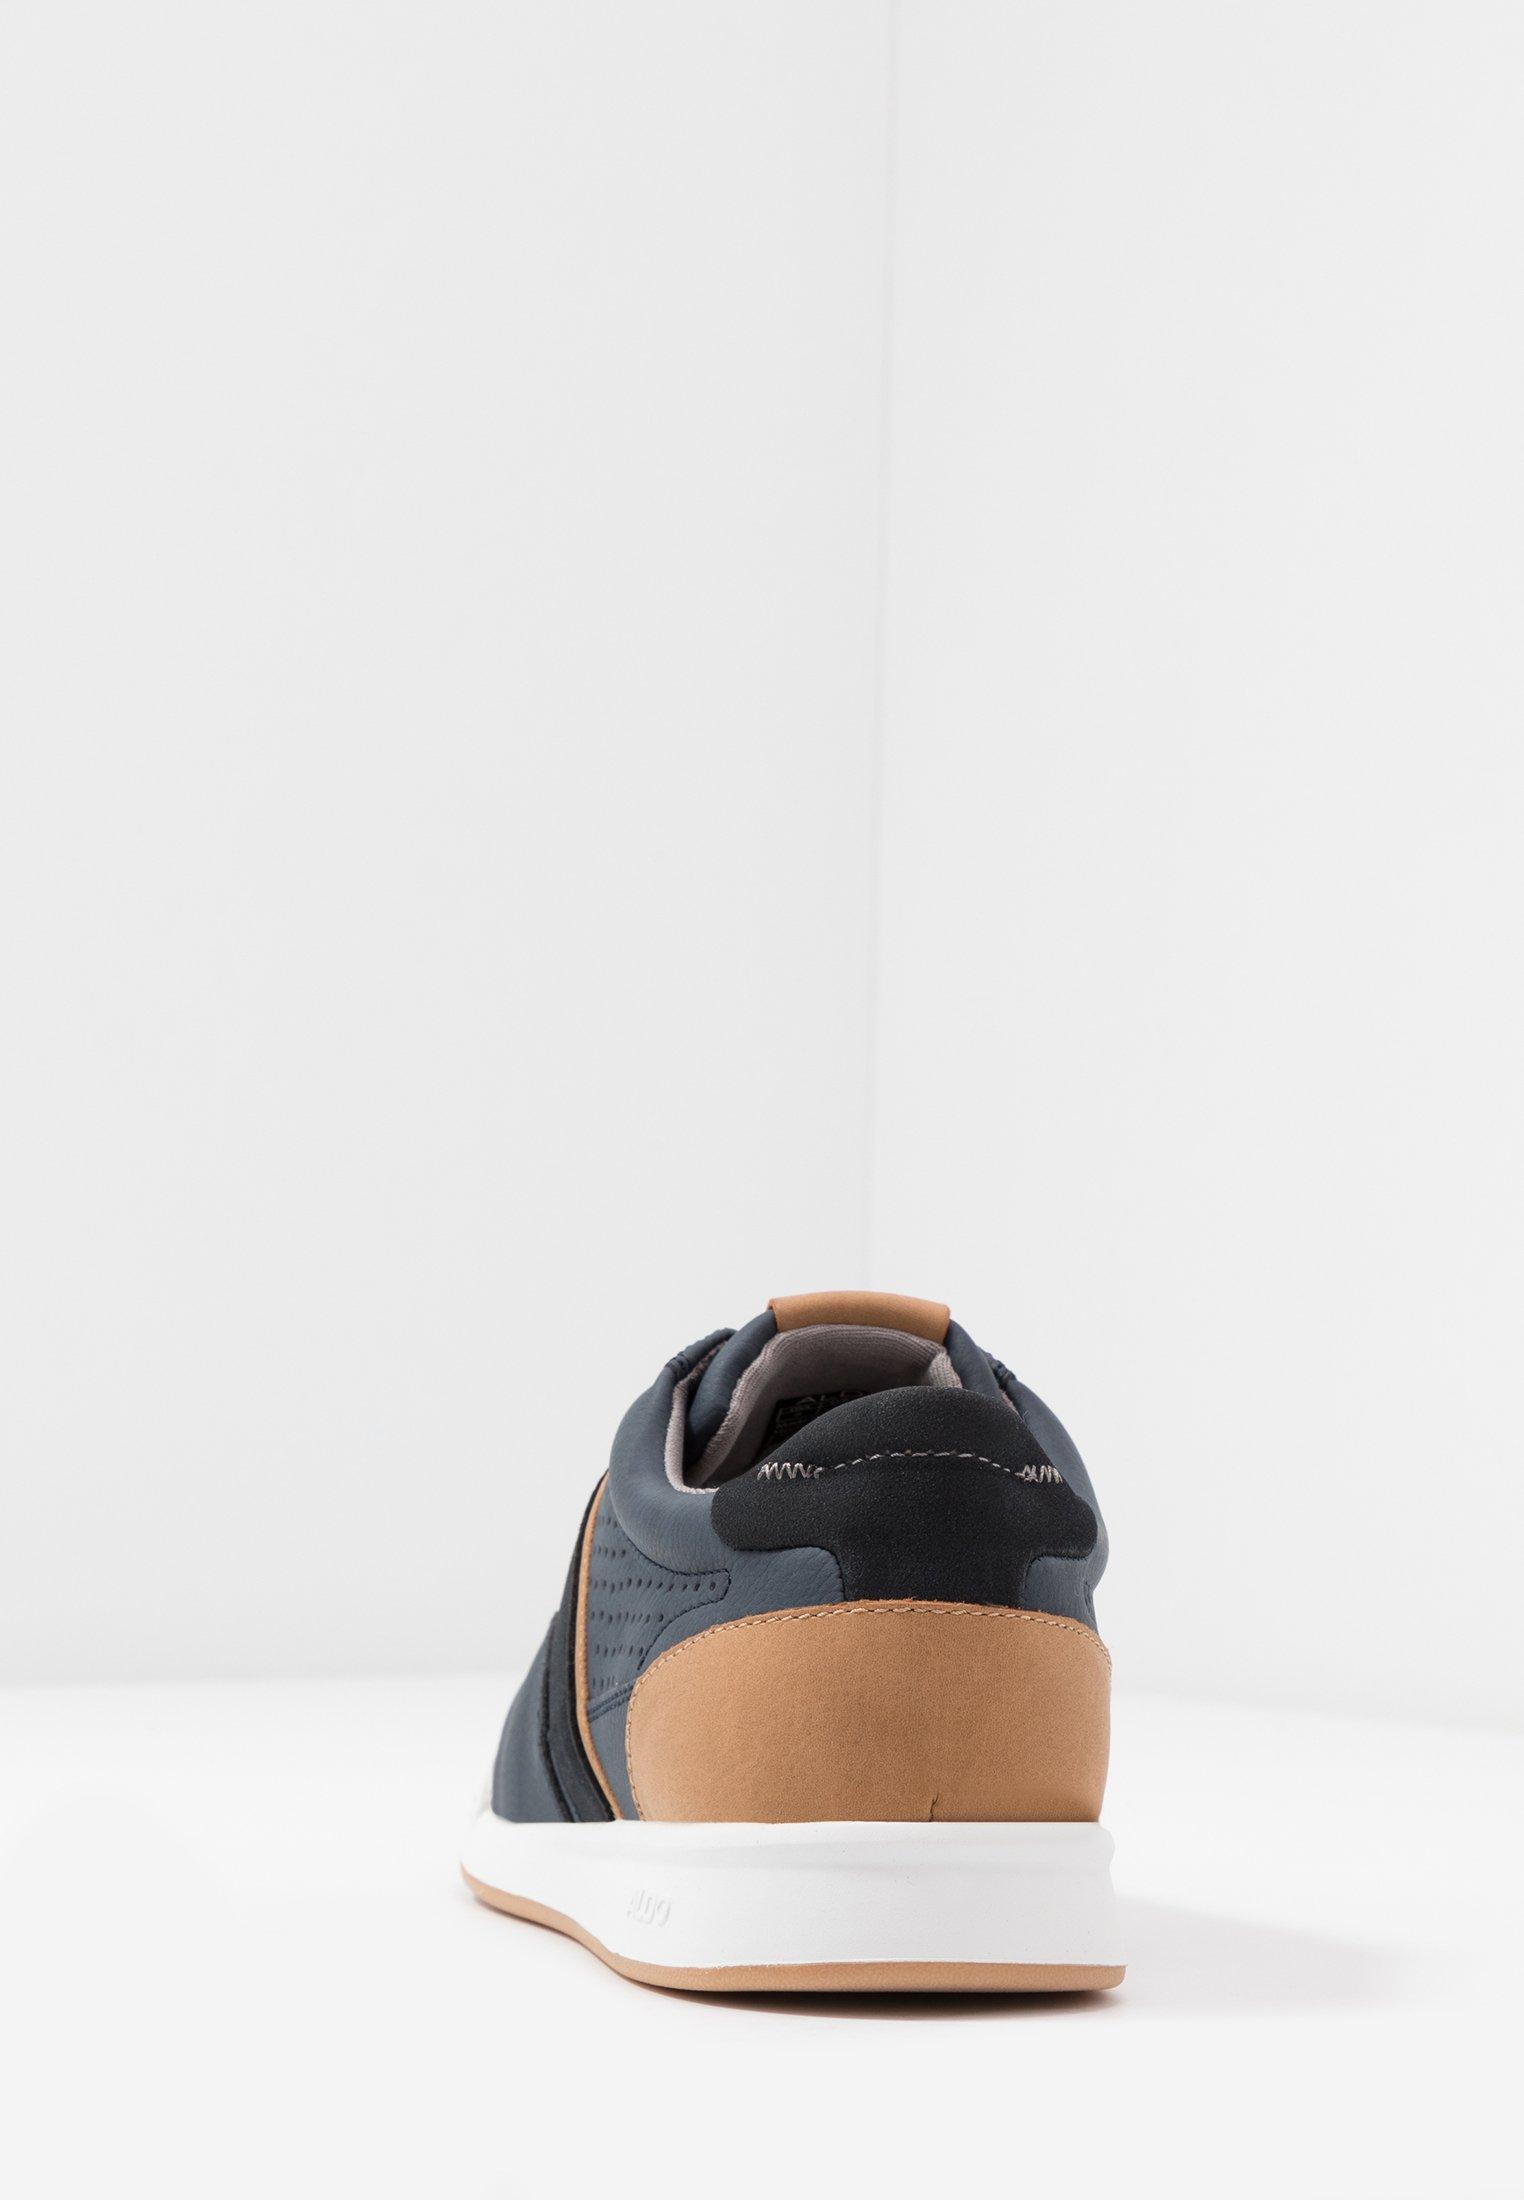 MIRERALLA Sneakers navy